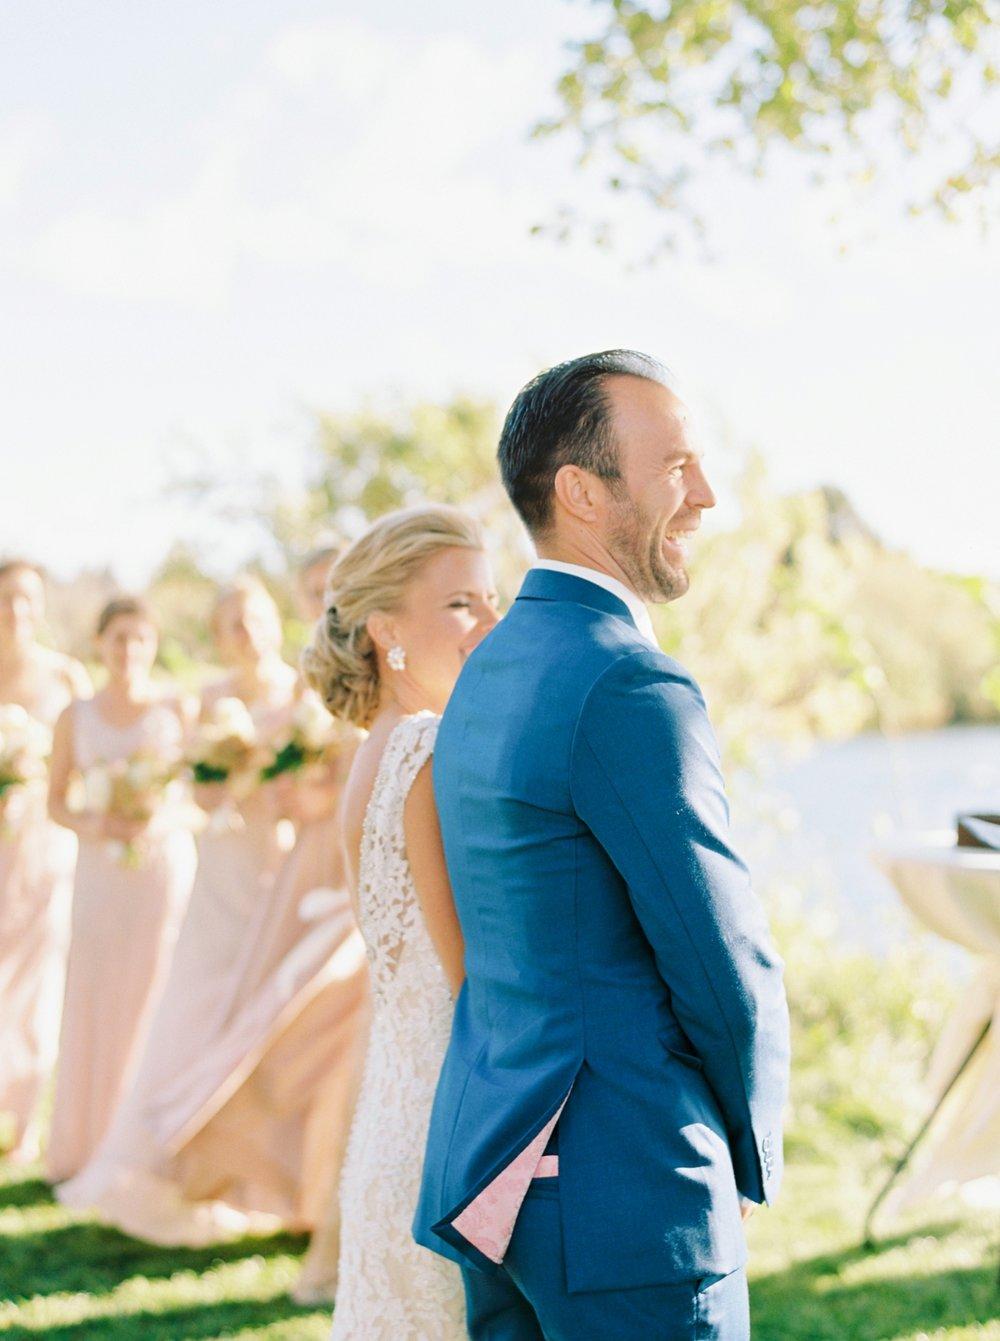 Calgary wedding photographers | oregon wedding photographers | fine art film | Justine Milton Photography | oregon wedding | wedding ceremony | bridesmaids | bride and groom